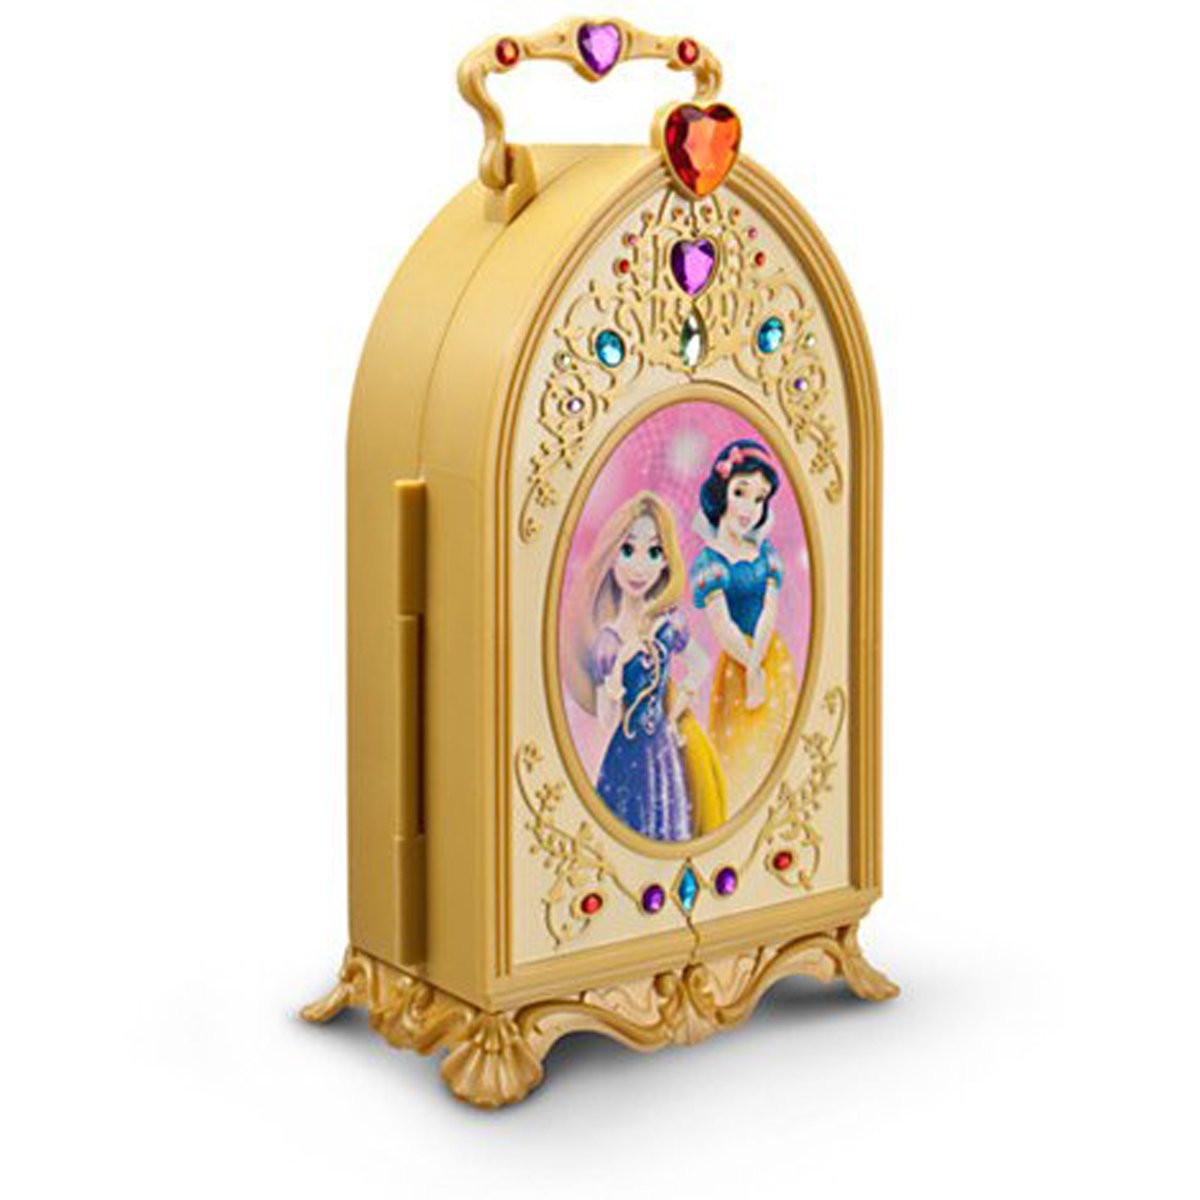 Amazoncom Disney Princess Magic Mirror Beauty Case Toddler